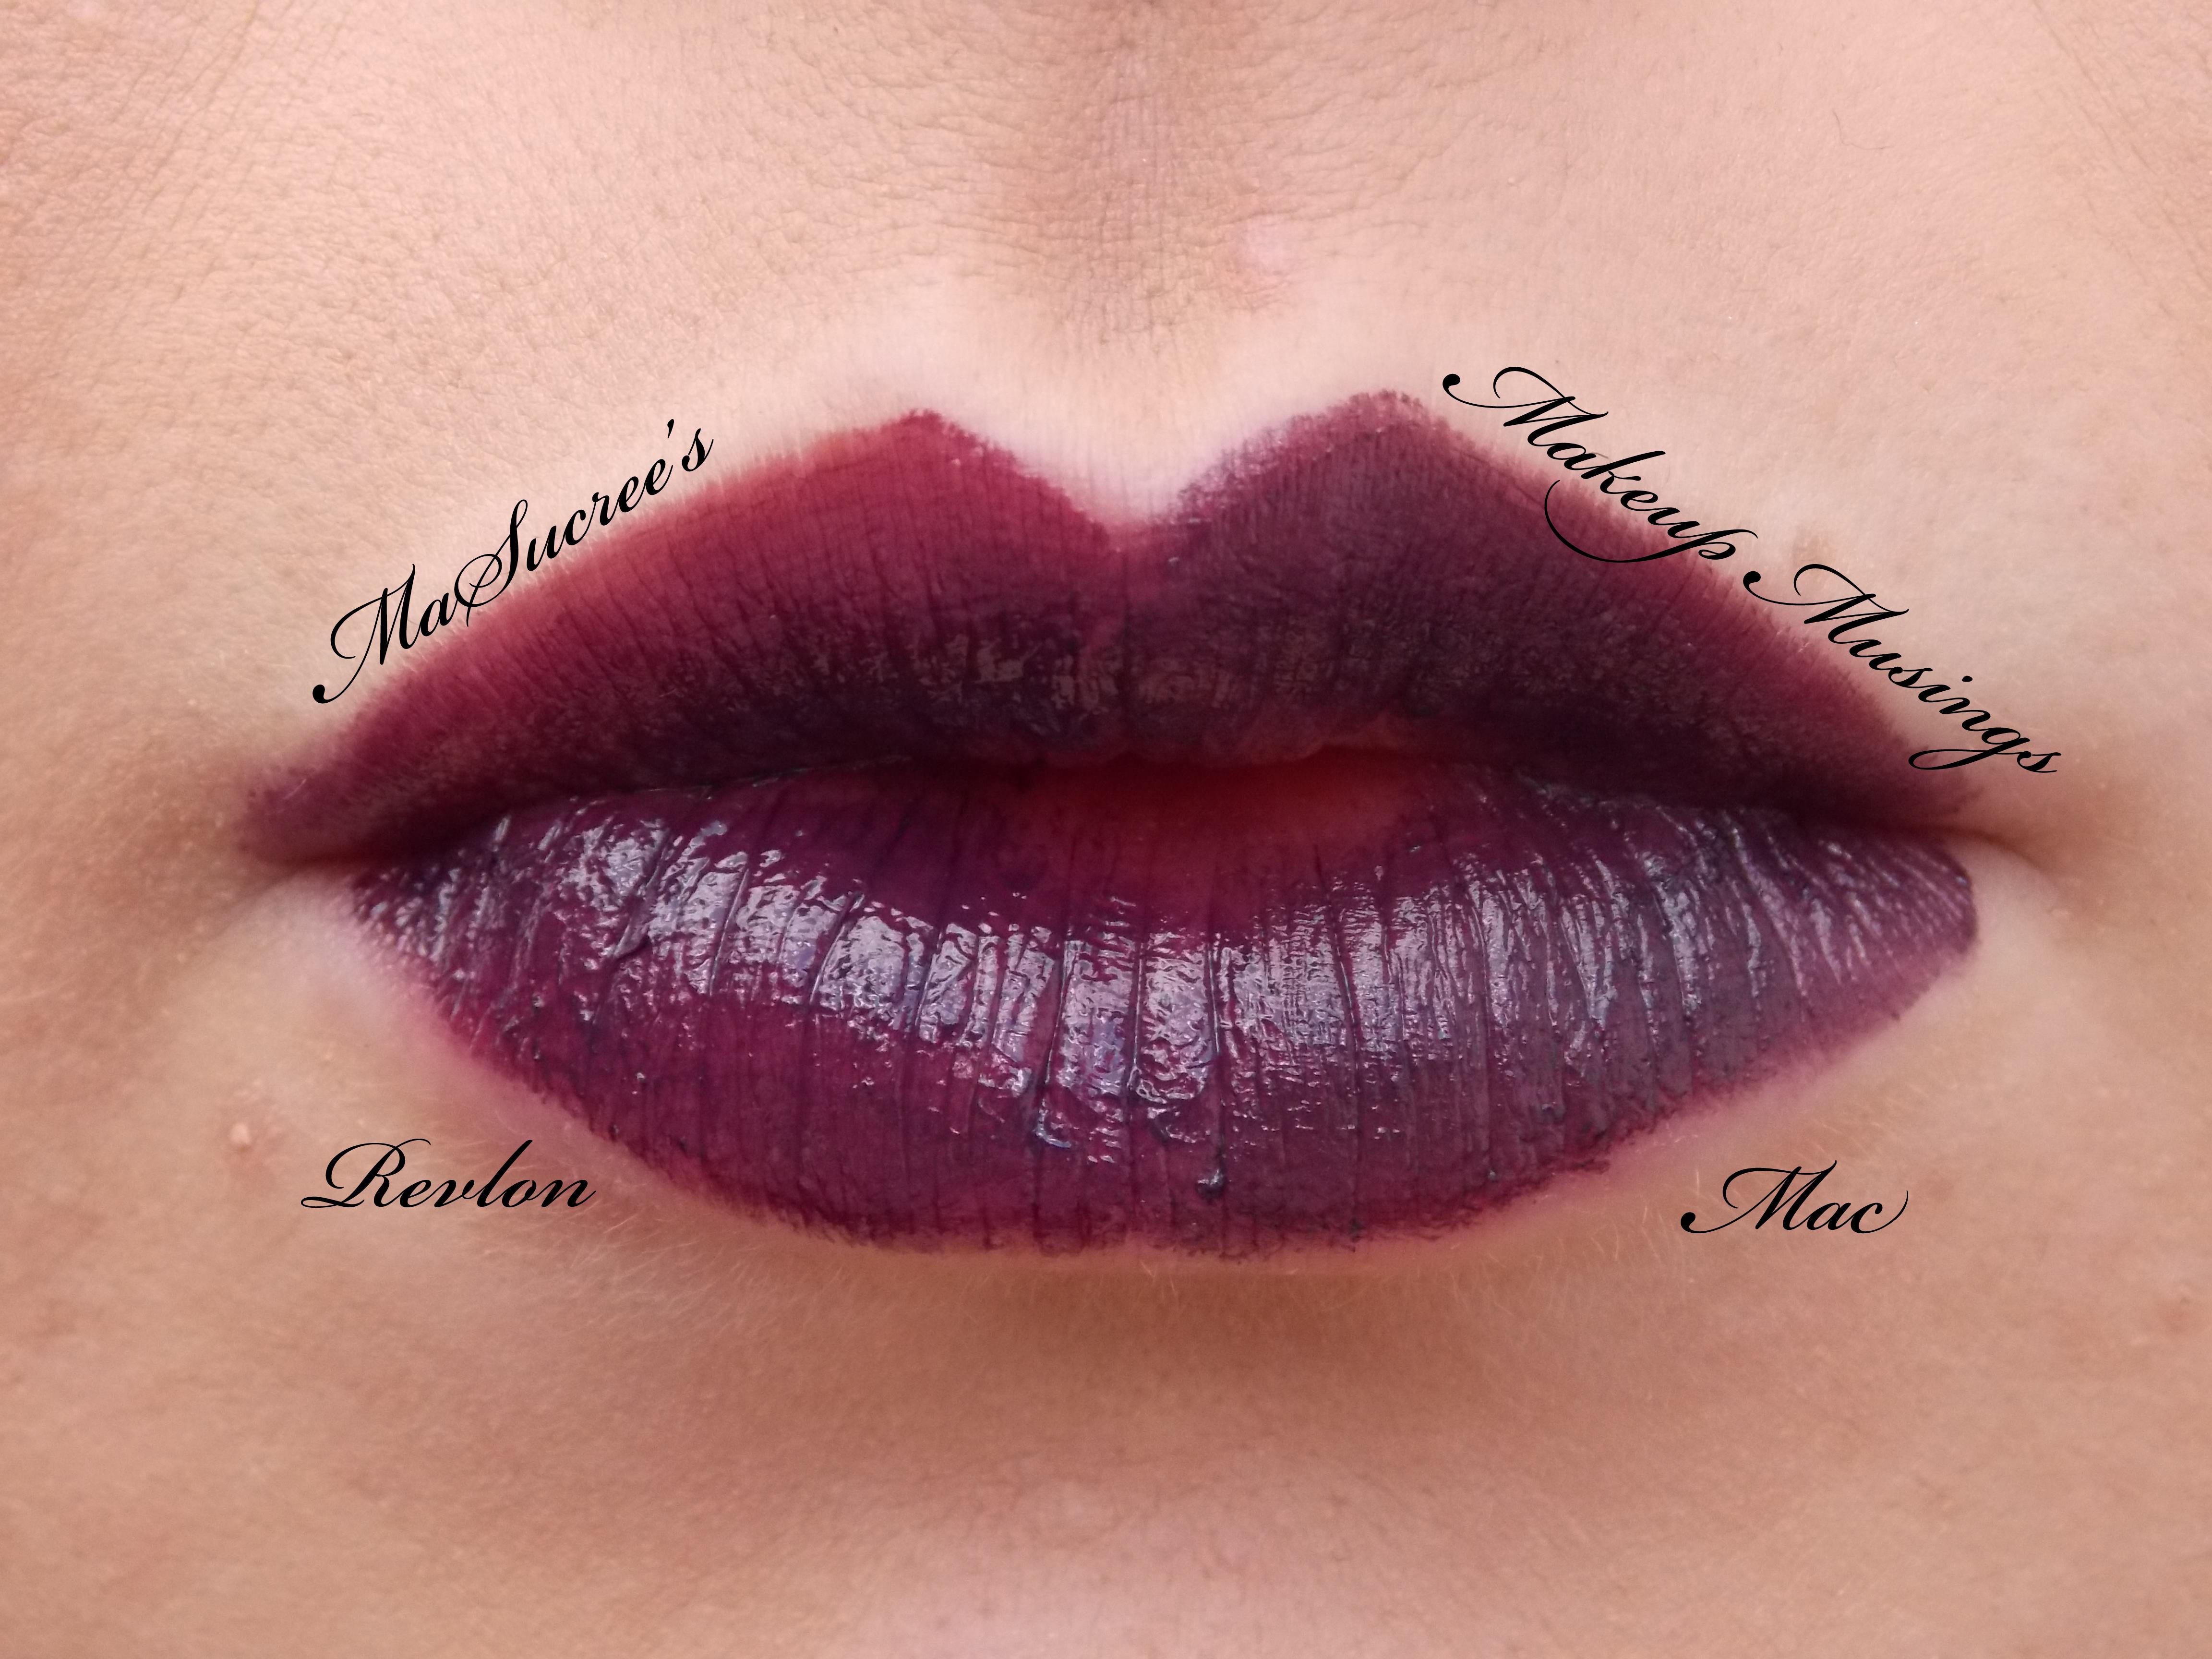 Mac Dark Purple Lipstick Name - Info